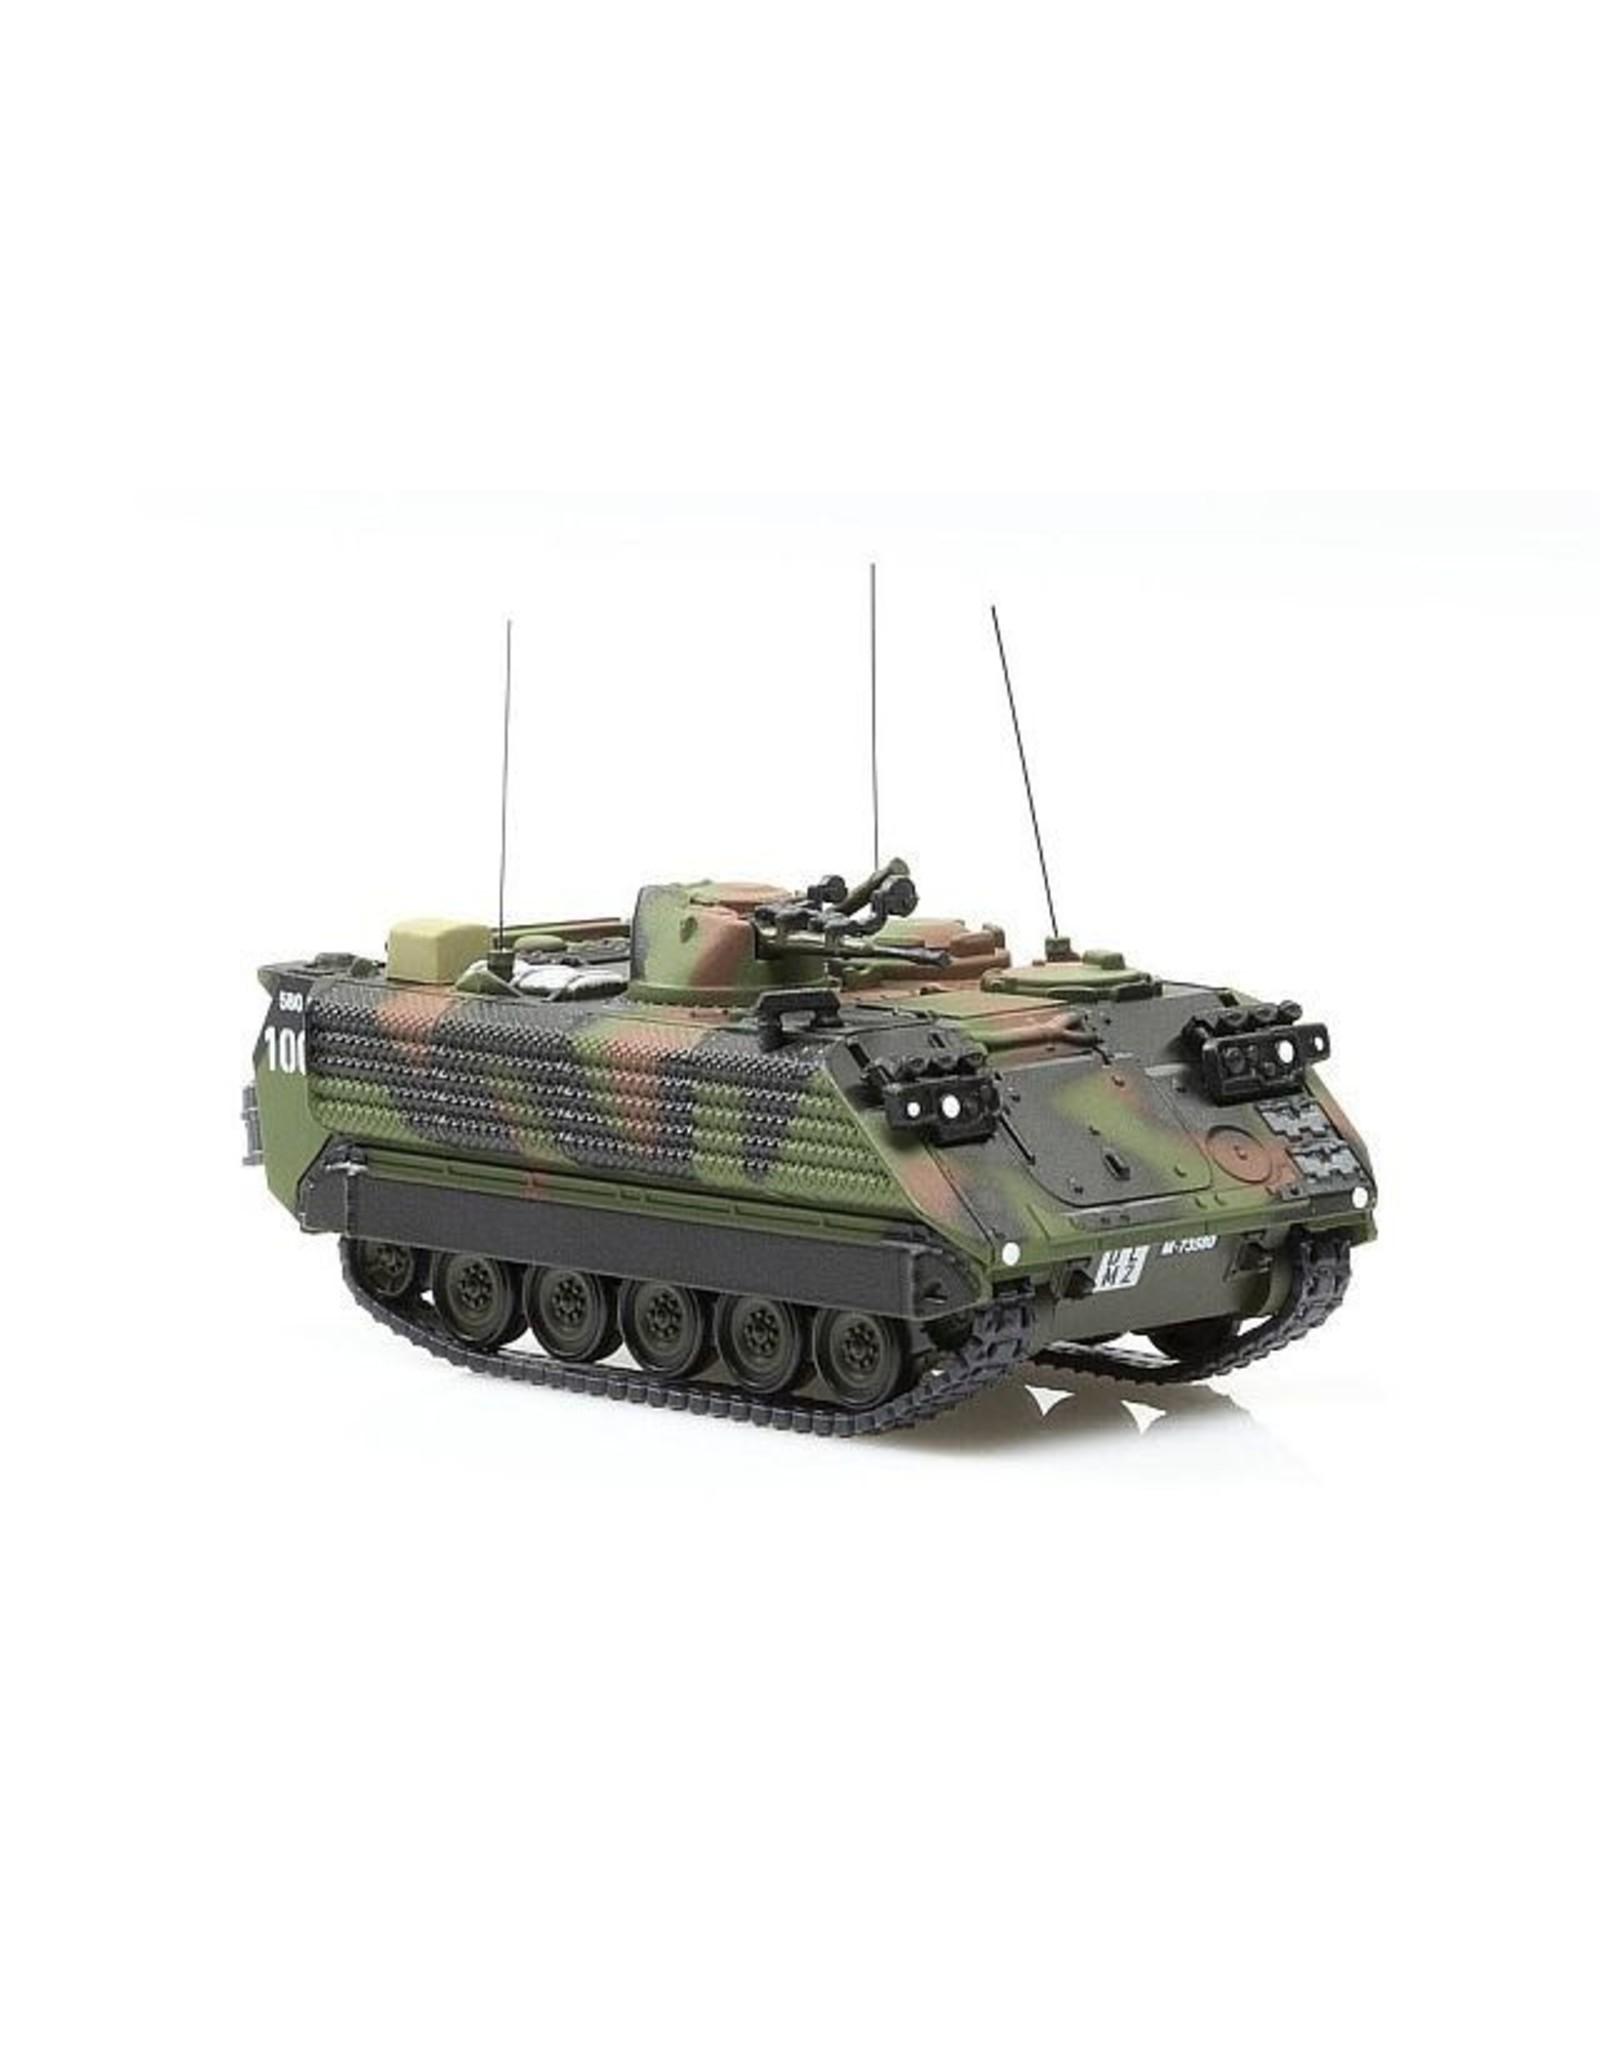 FMC ARMOURED TRACKED VEHICLE Spz89